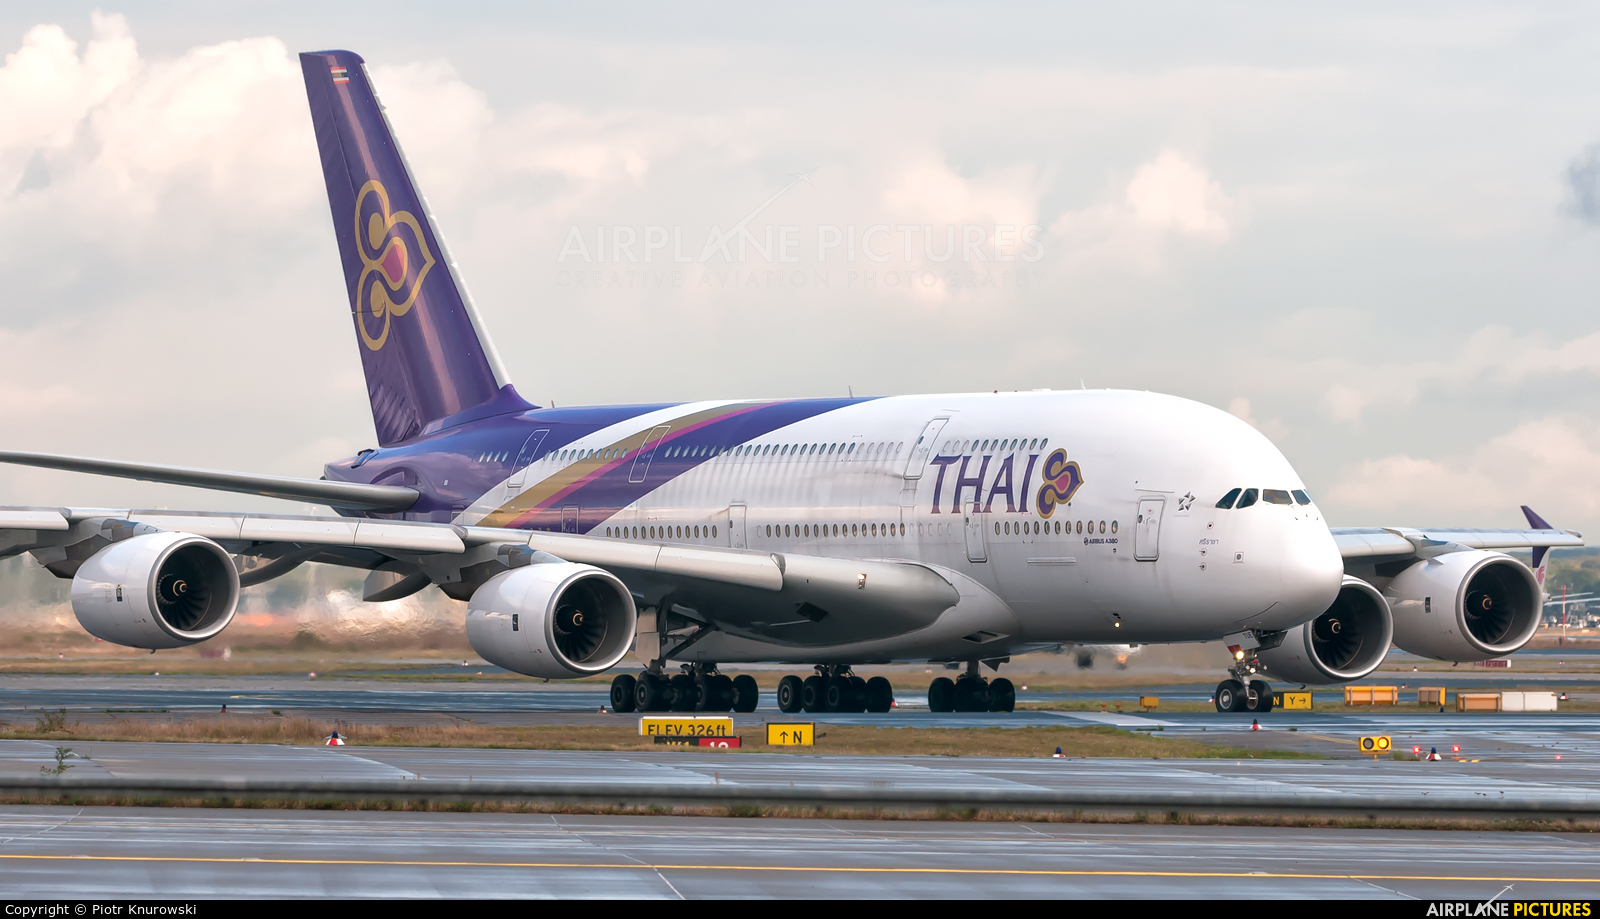 Thai Airways HS-TUE aircraft at Frankfurt